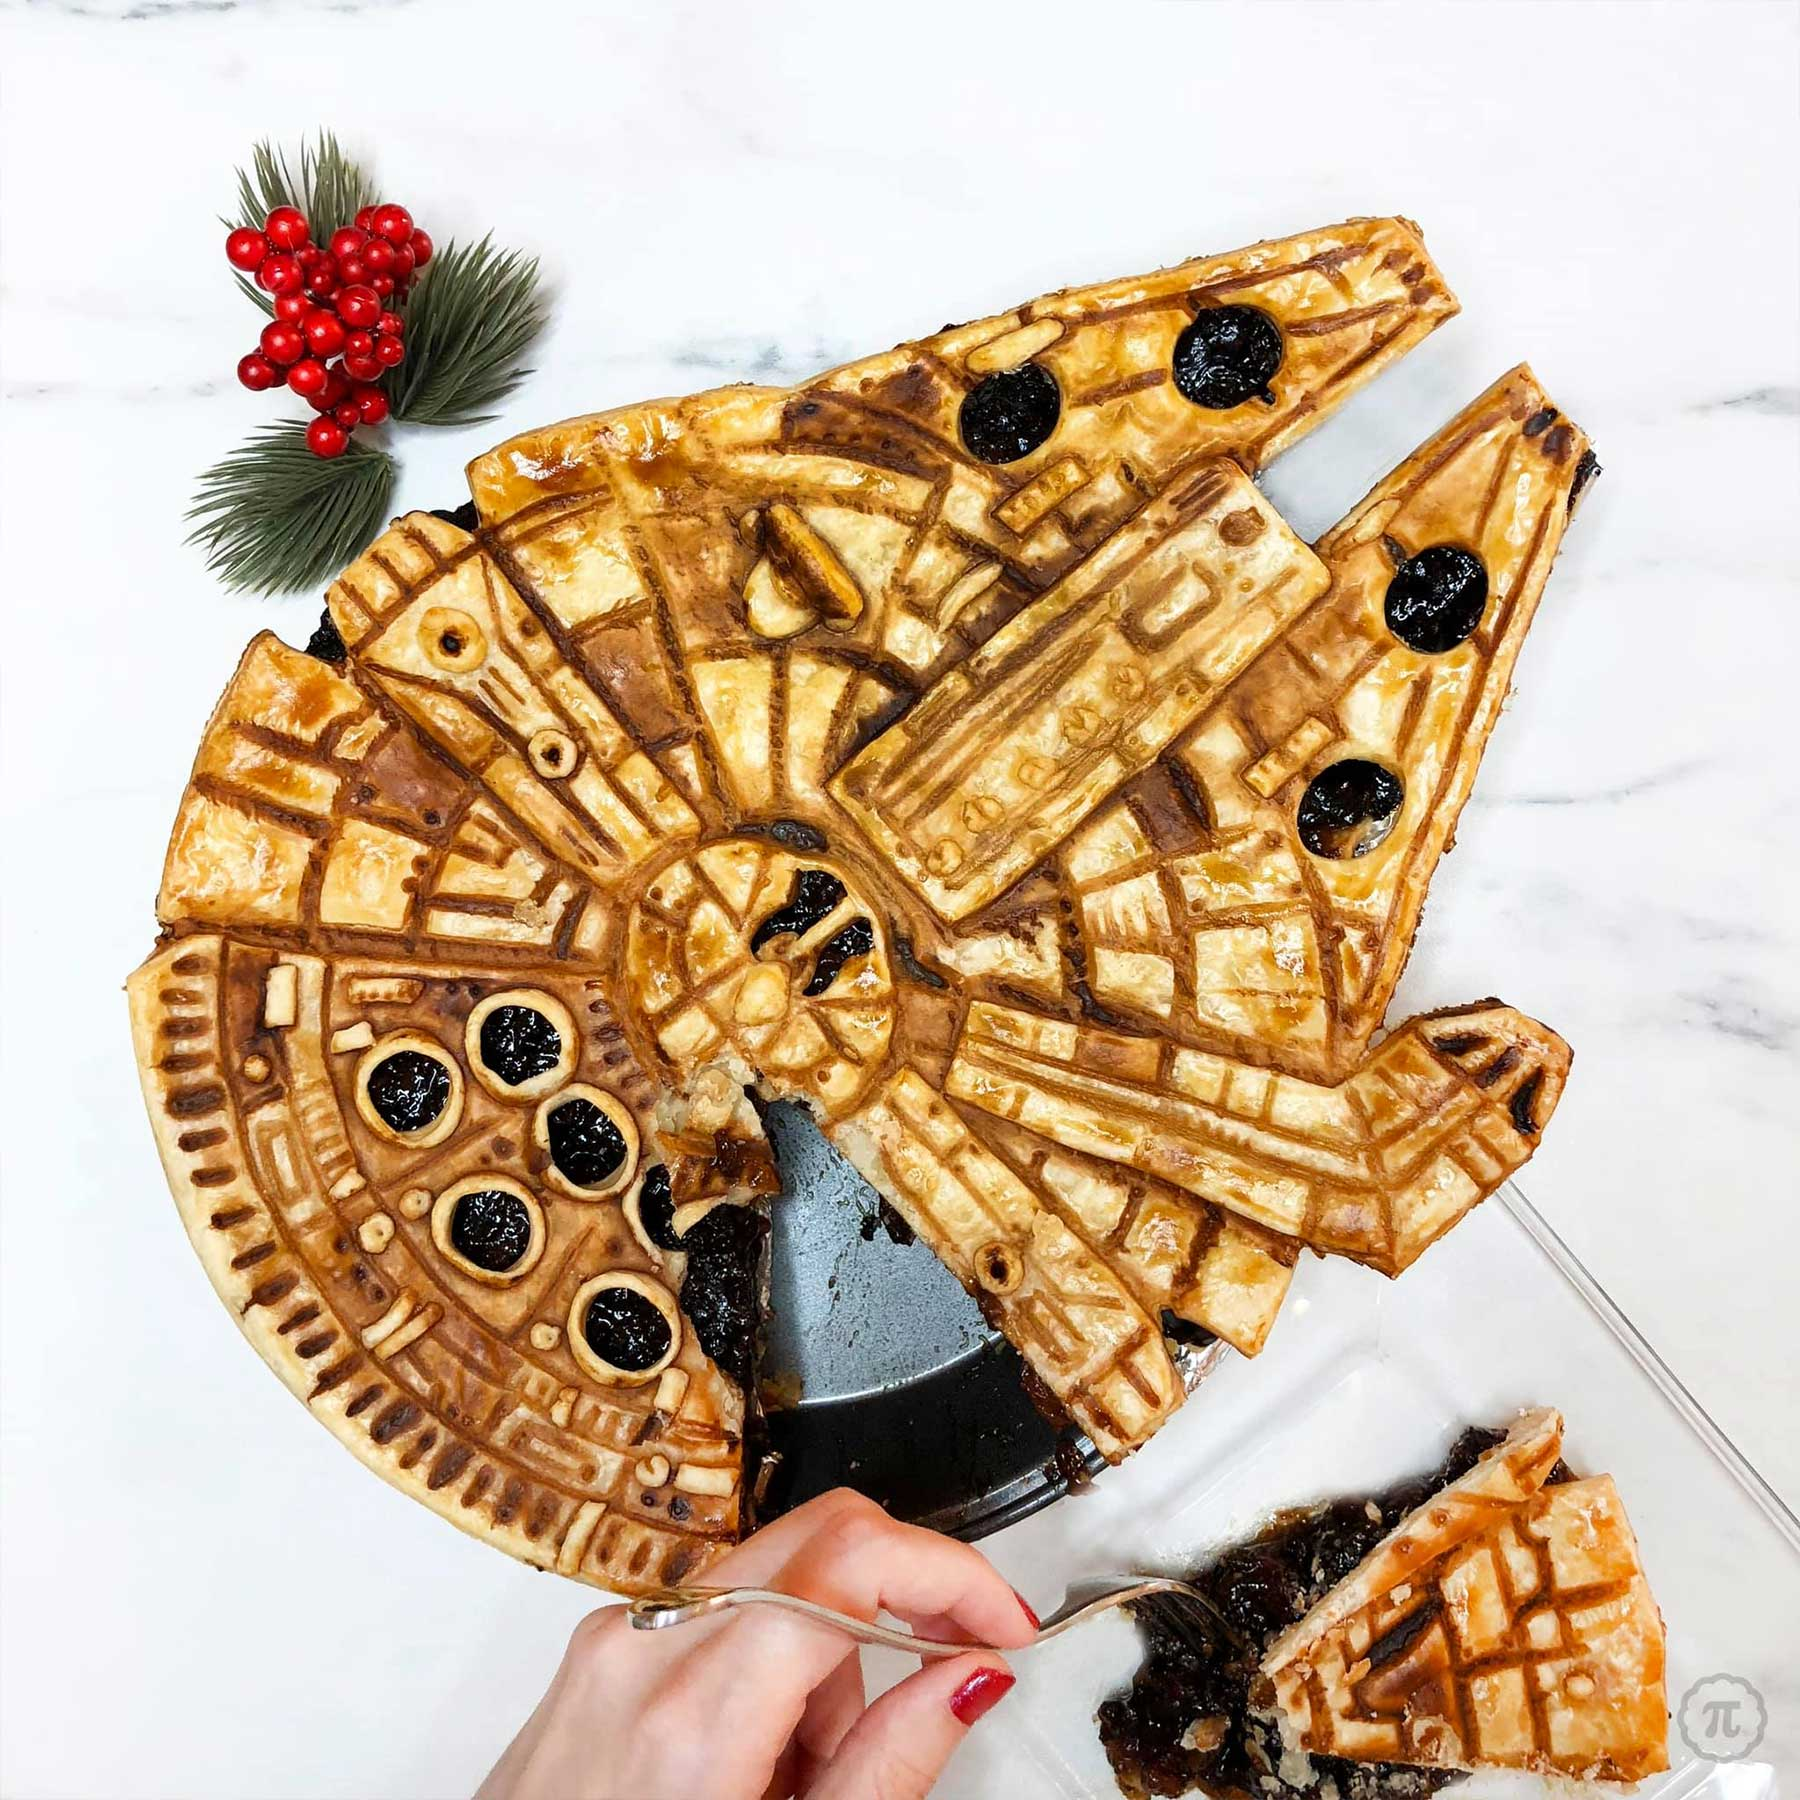 Kreative Kuchenkunst von Jessica Clark-Bojin piesareawesome-Jessica-Clark-Bojin_04